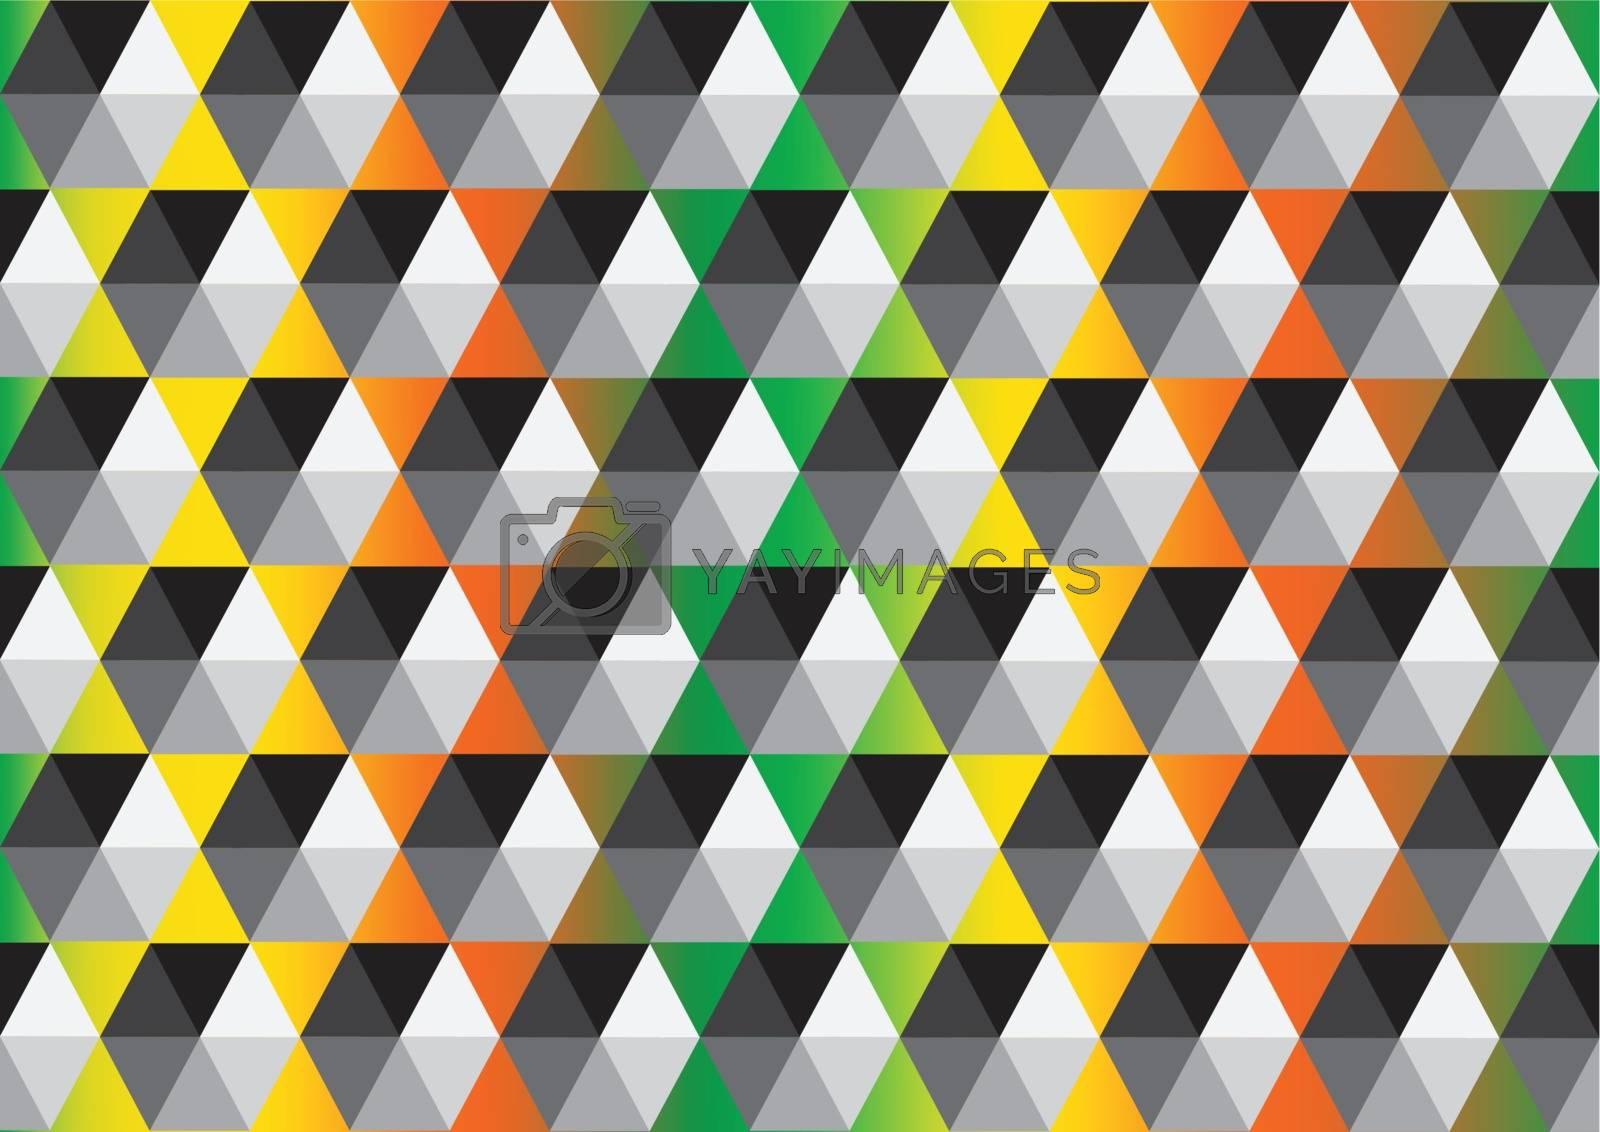 Geometric  abstract  background  by kiddaikiddee